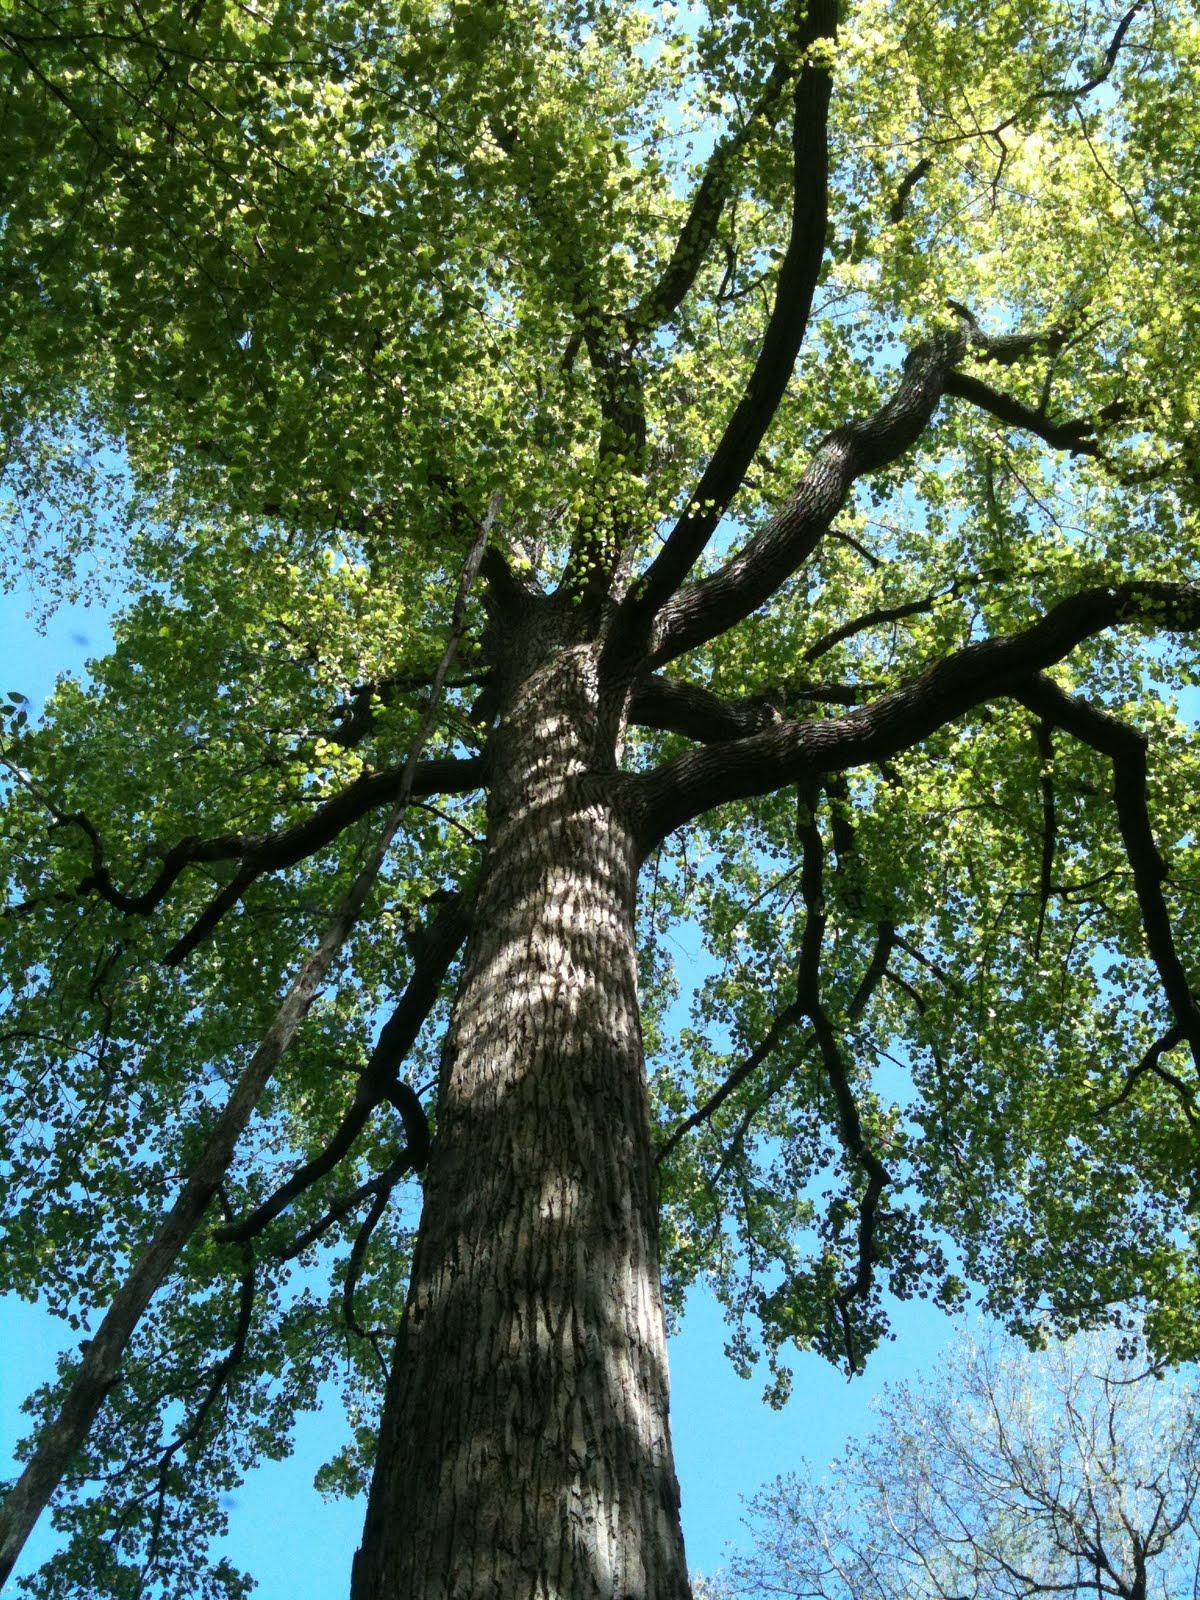 5-13-11 004 Oak at Eno Marsh.jpg